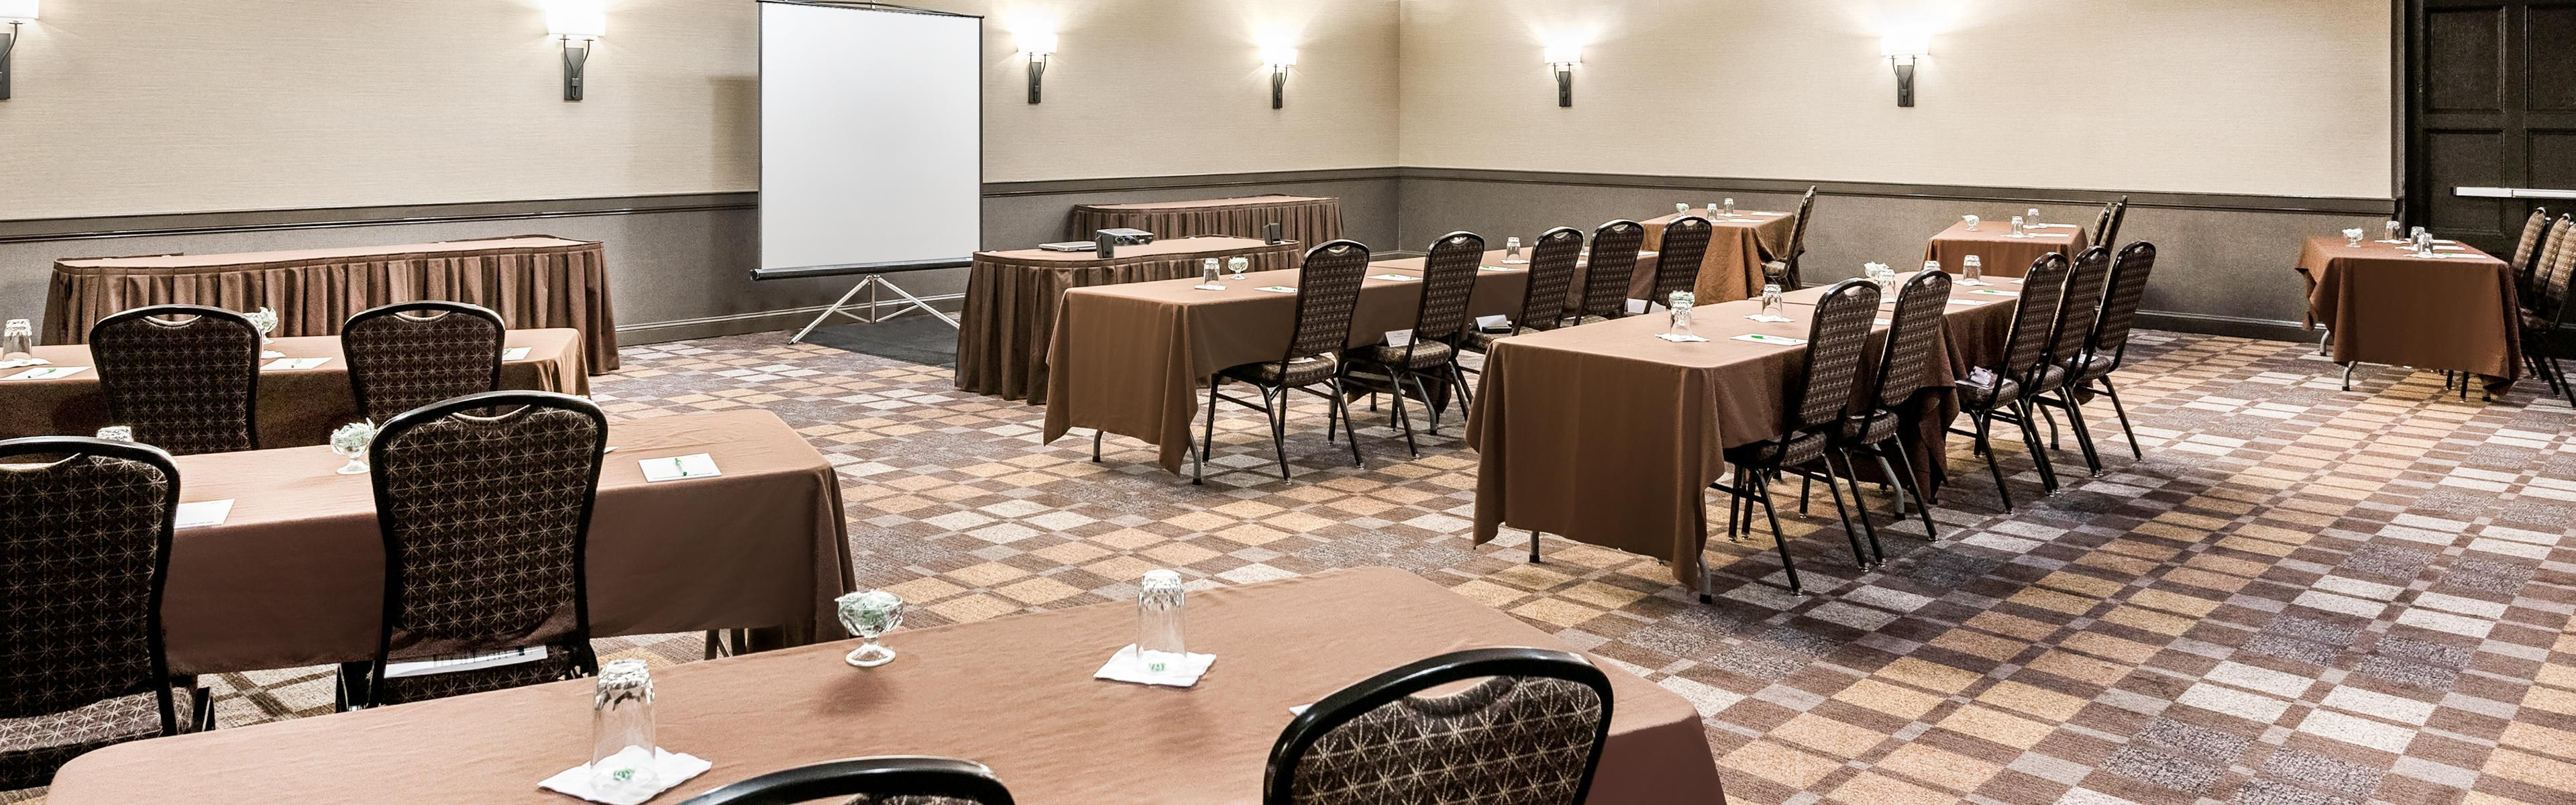 holiday inn johnstown gloversville hotel groups meeting rooms rh ihg com